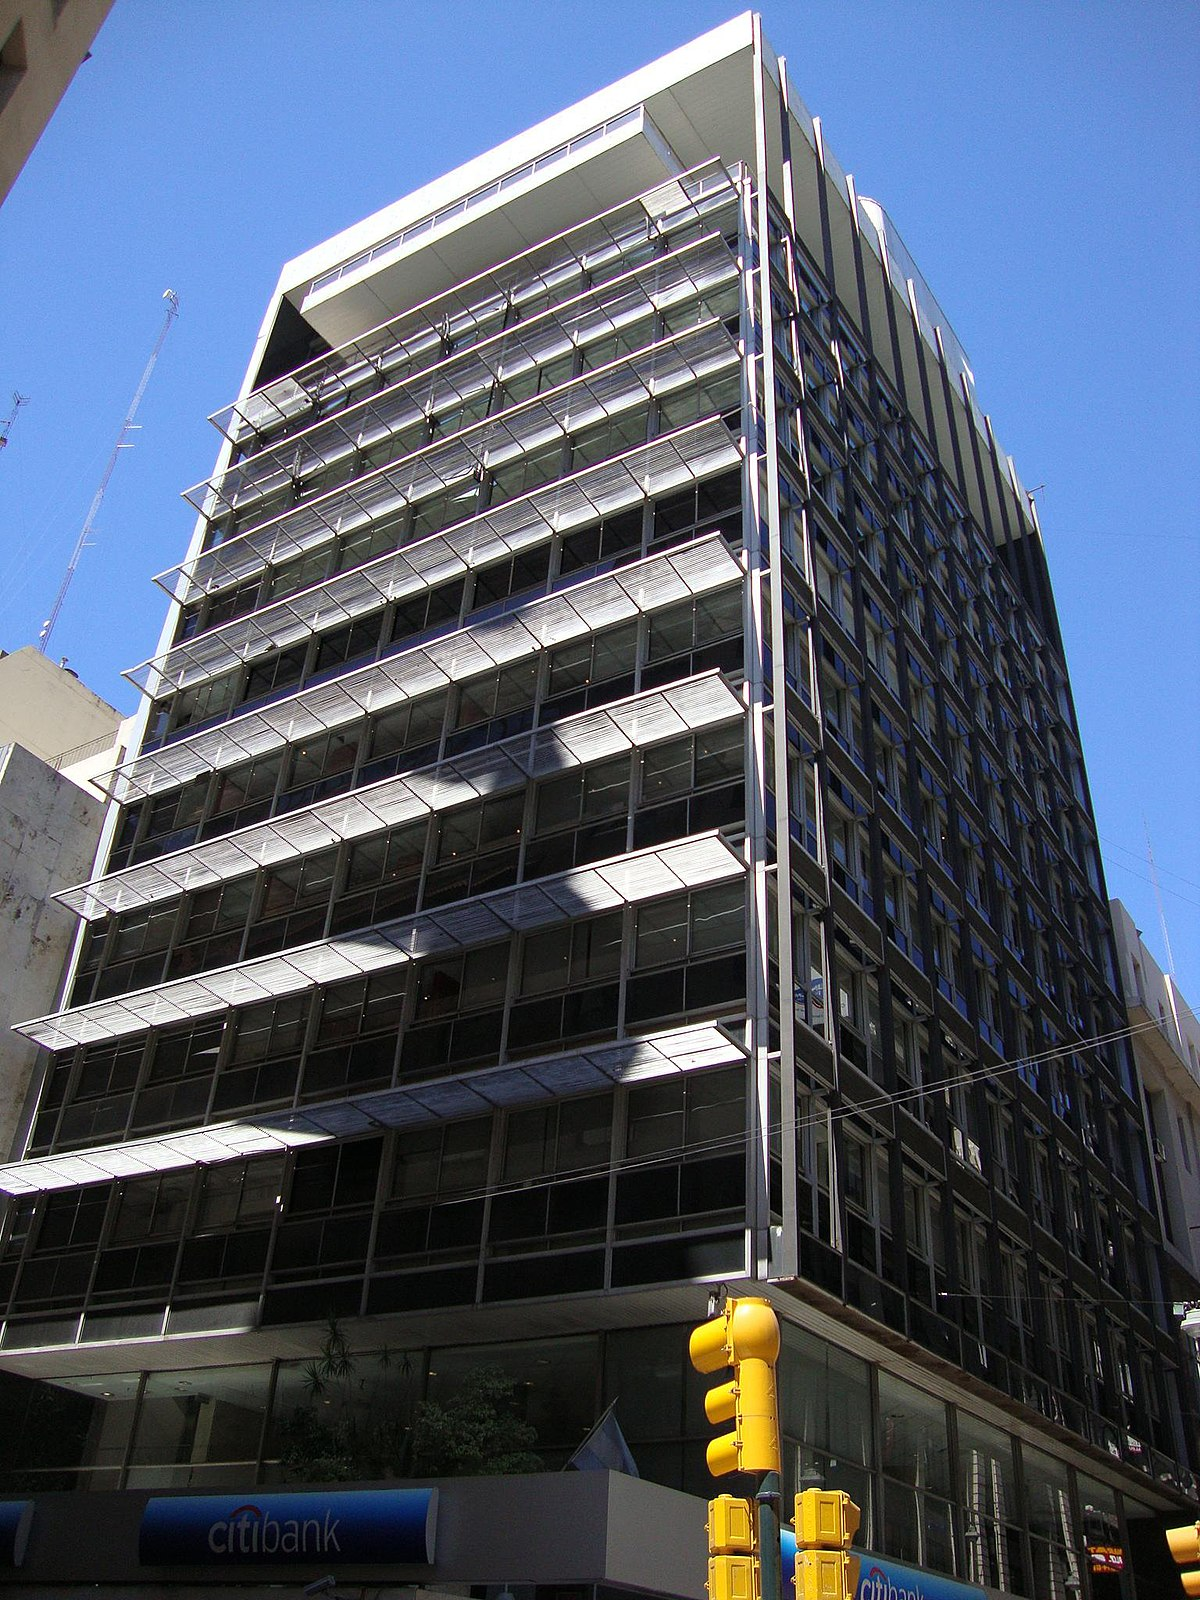 Banco popular argentino anexo casa central wikipedia for Oficinas banco popular cordoba